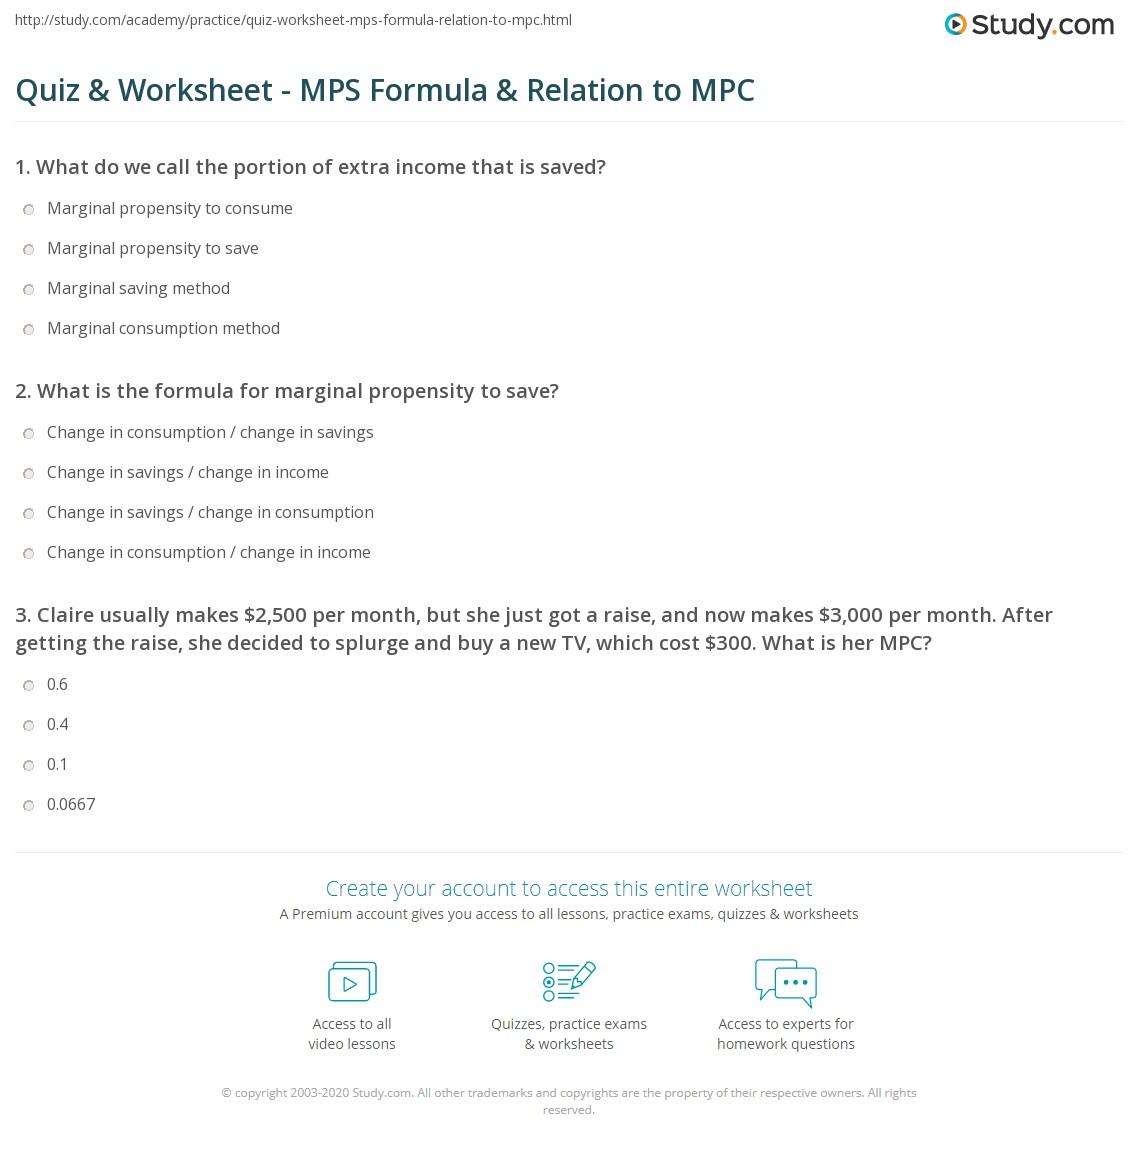 Quiz & Worksheet - MPS Formula & Relation to MPC | Study.com